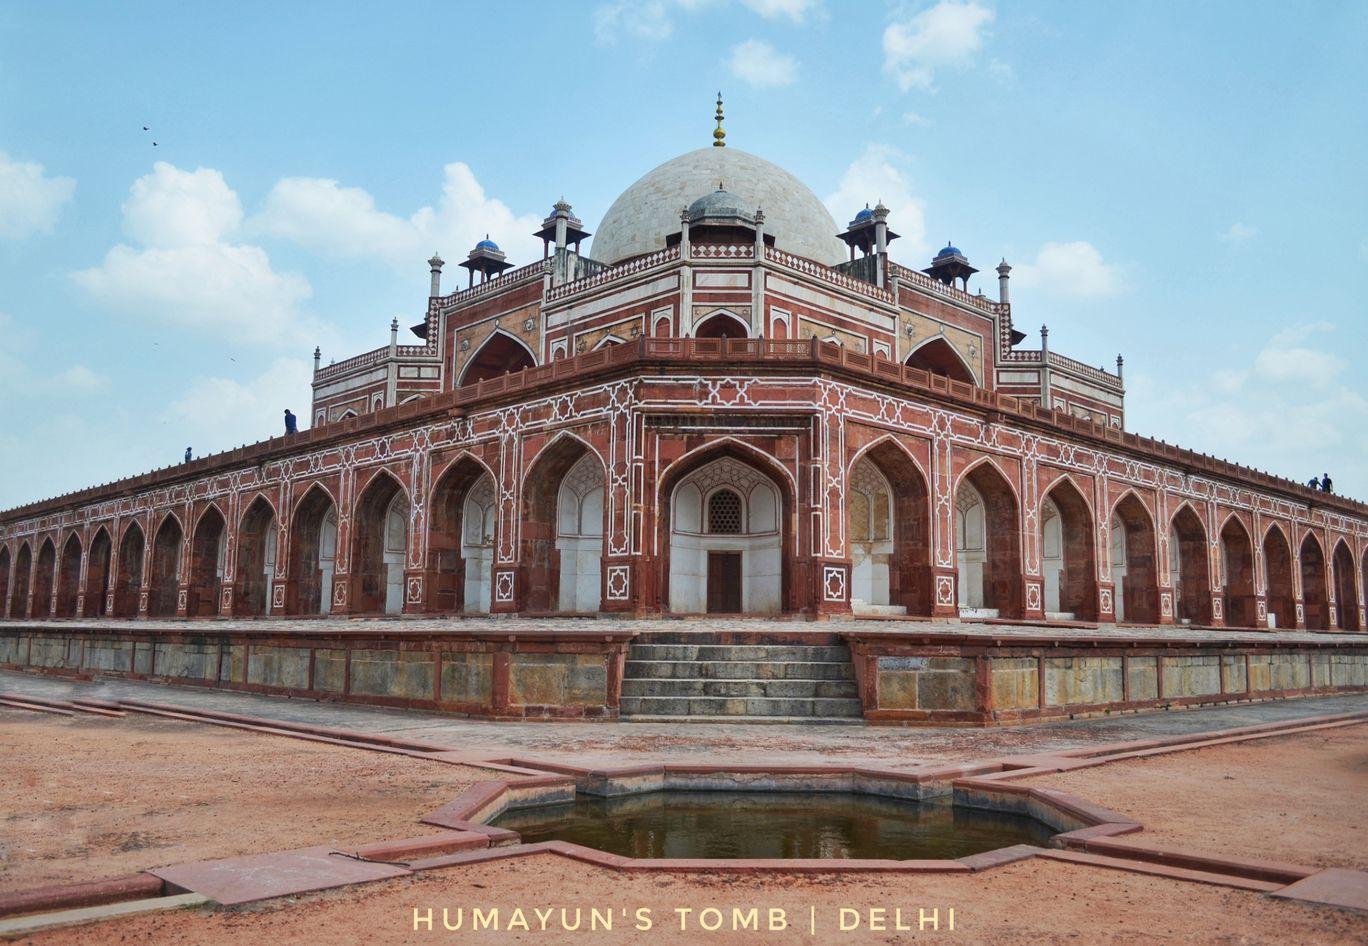 Photo of Humayun's Tomb By Akarshan Sapra